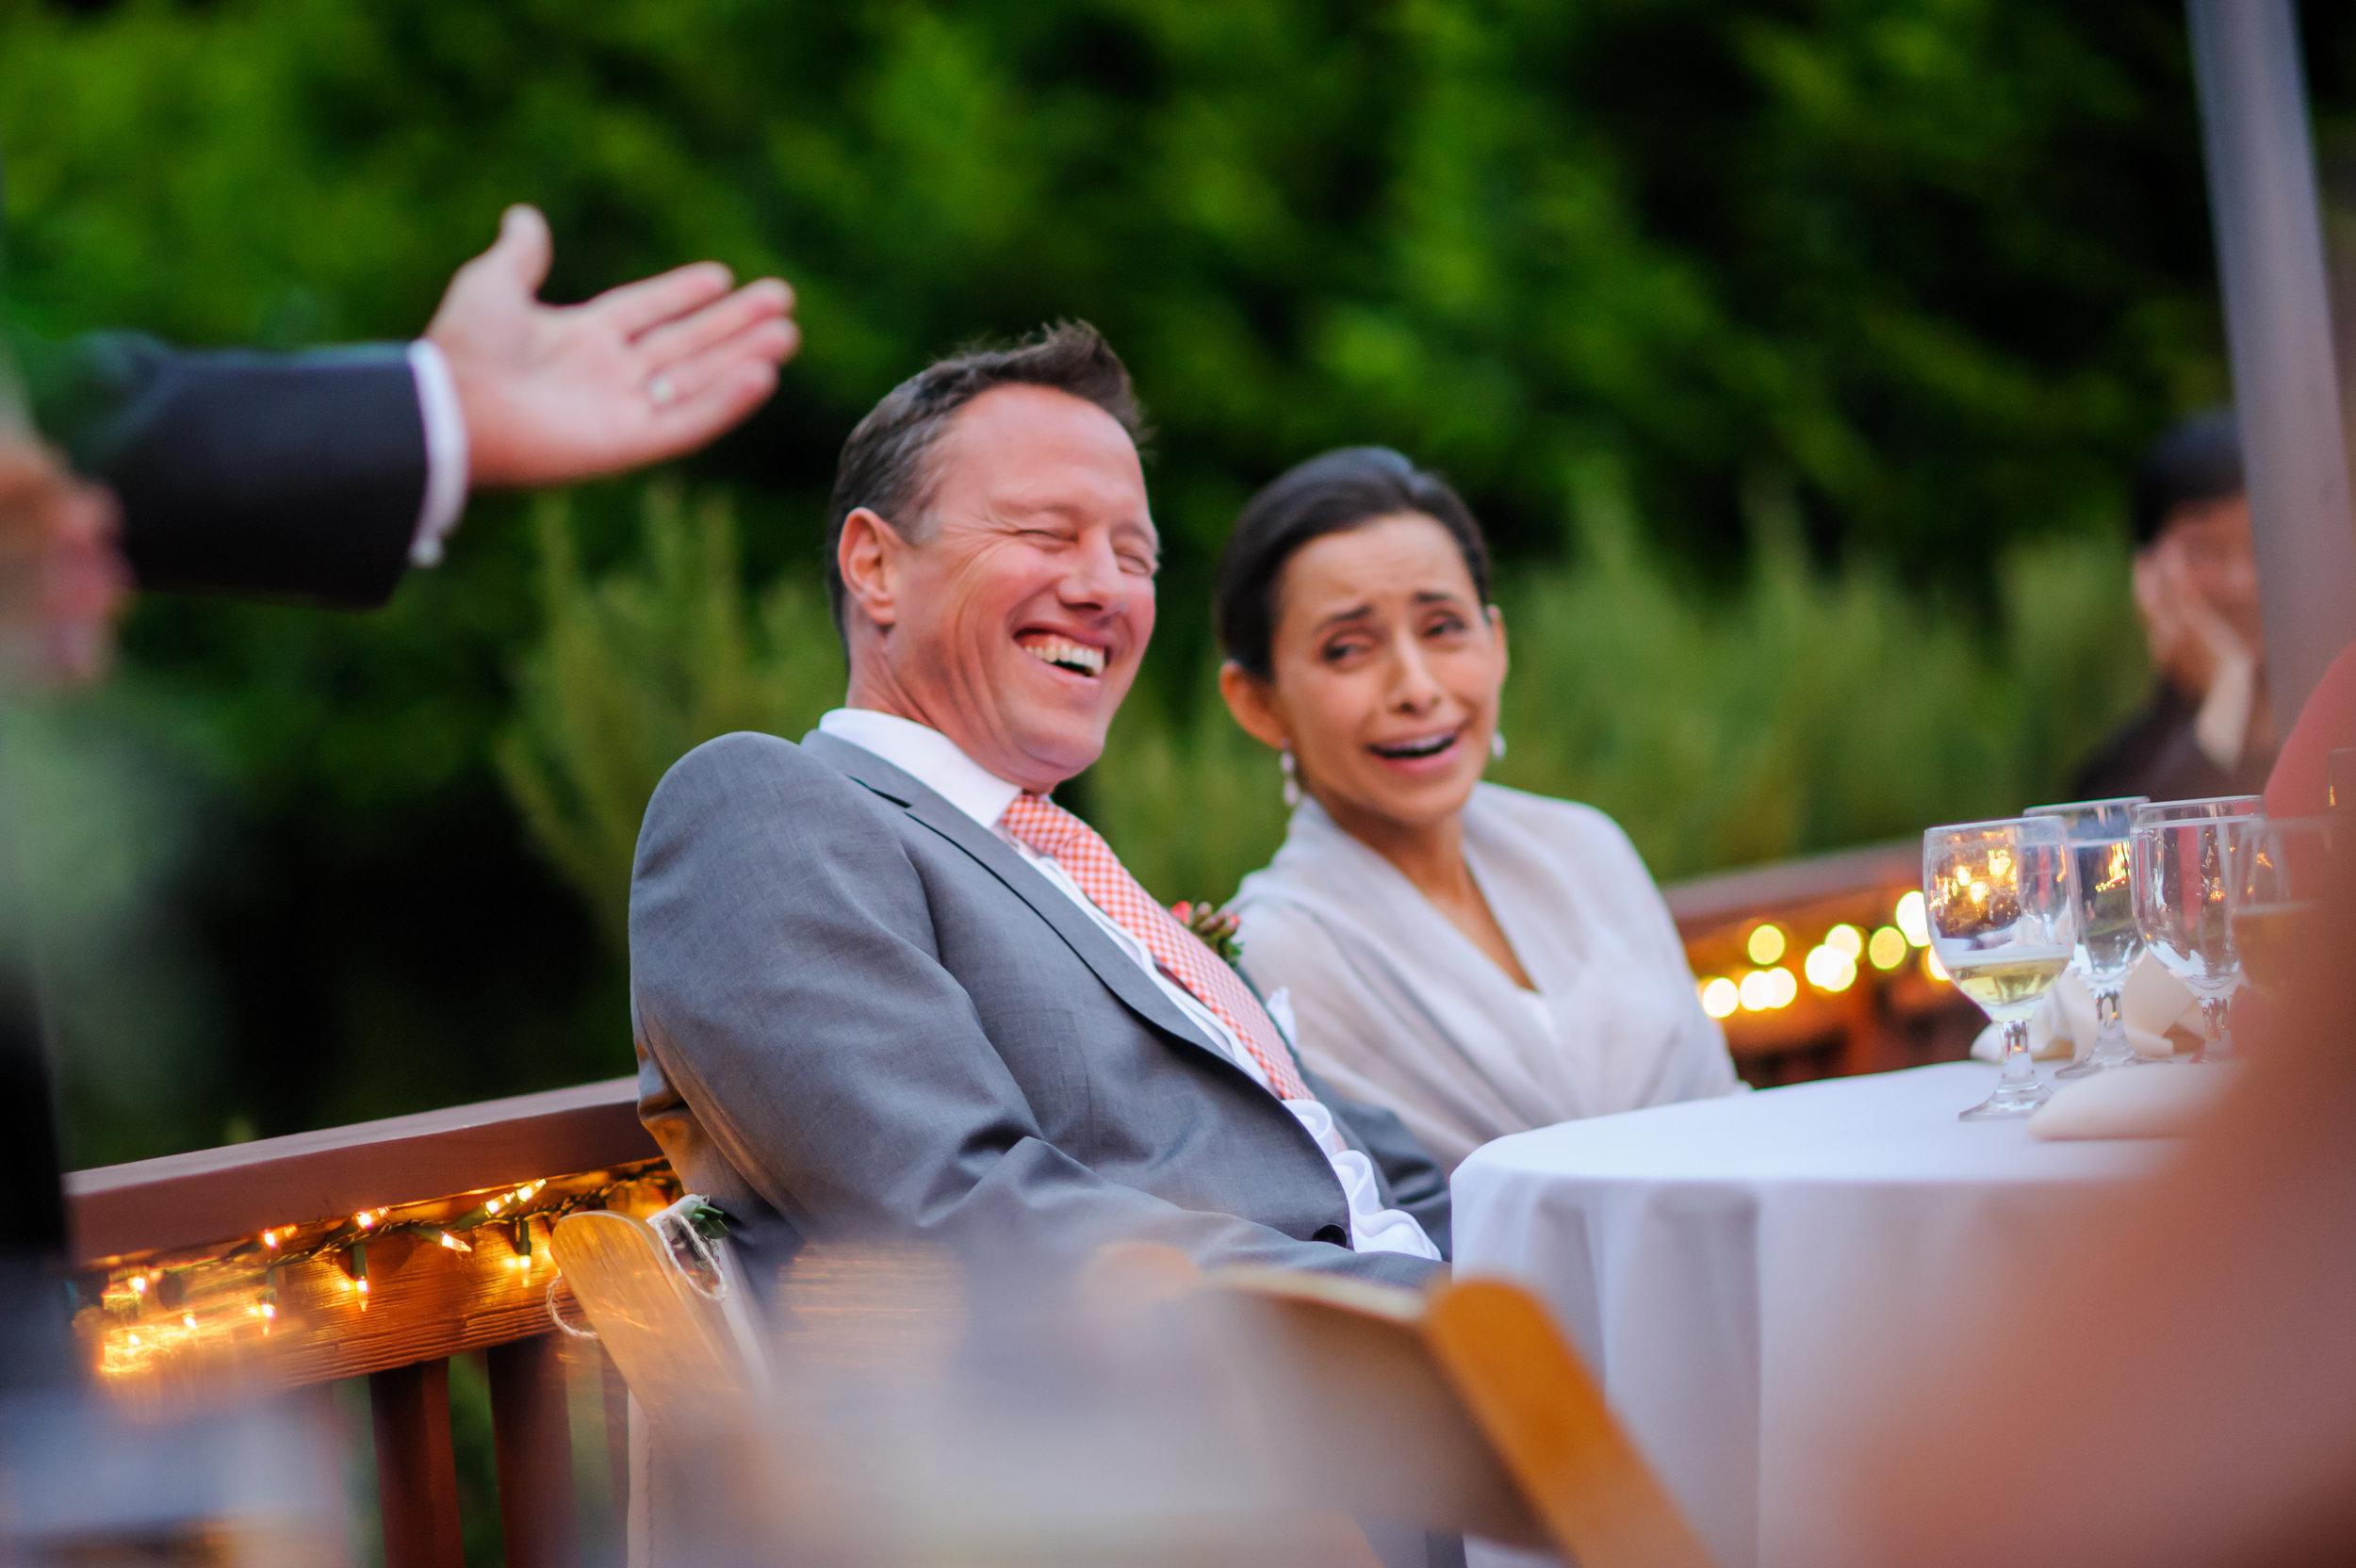 janet-jeremy-036-mountain-terrace-woodside-wedding-photographer-katherine-nicole-photography.JPG